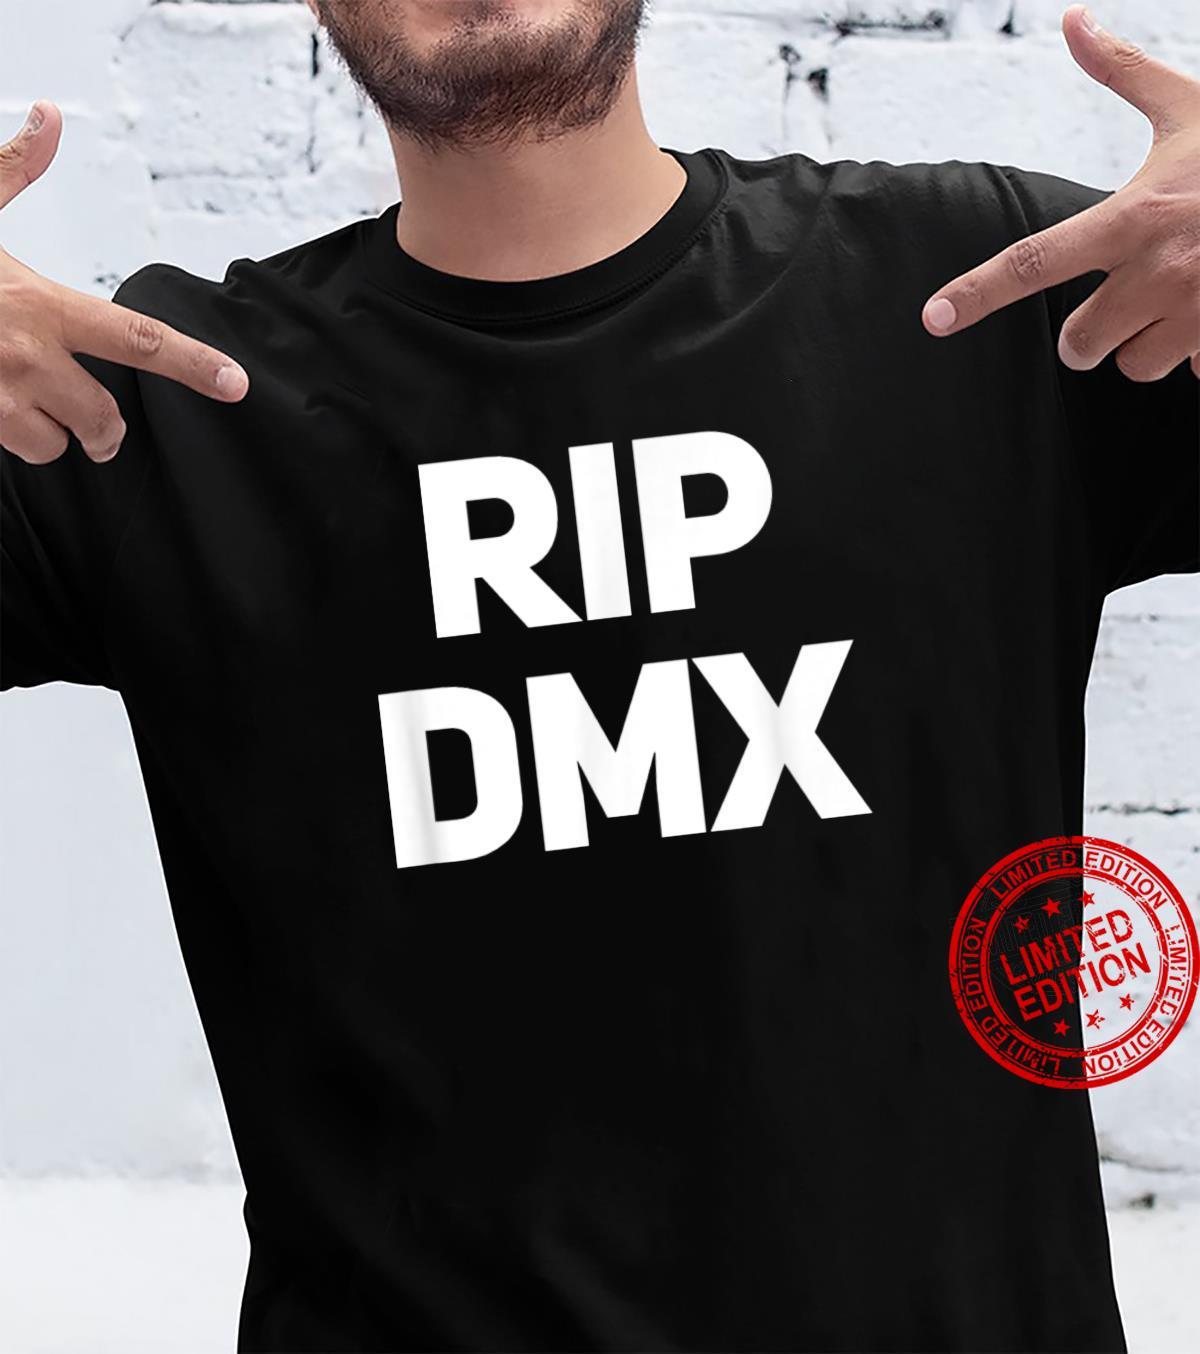 Rip Rapper dmx shirt, hoodie, sweater, long sleeve and tank top